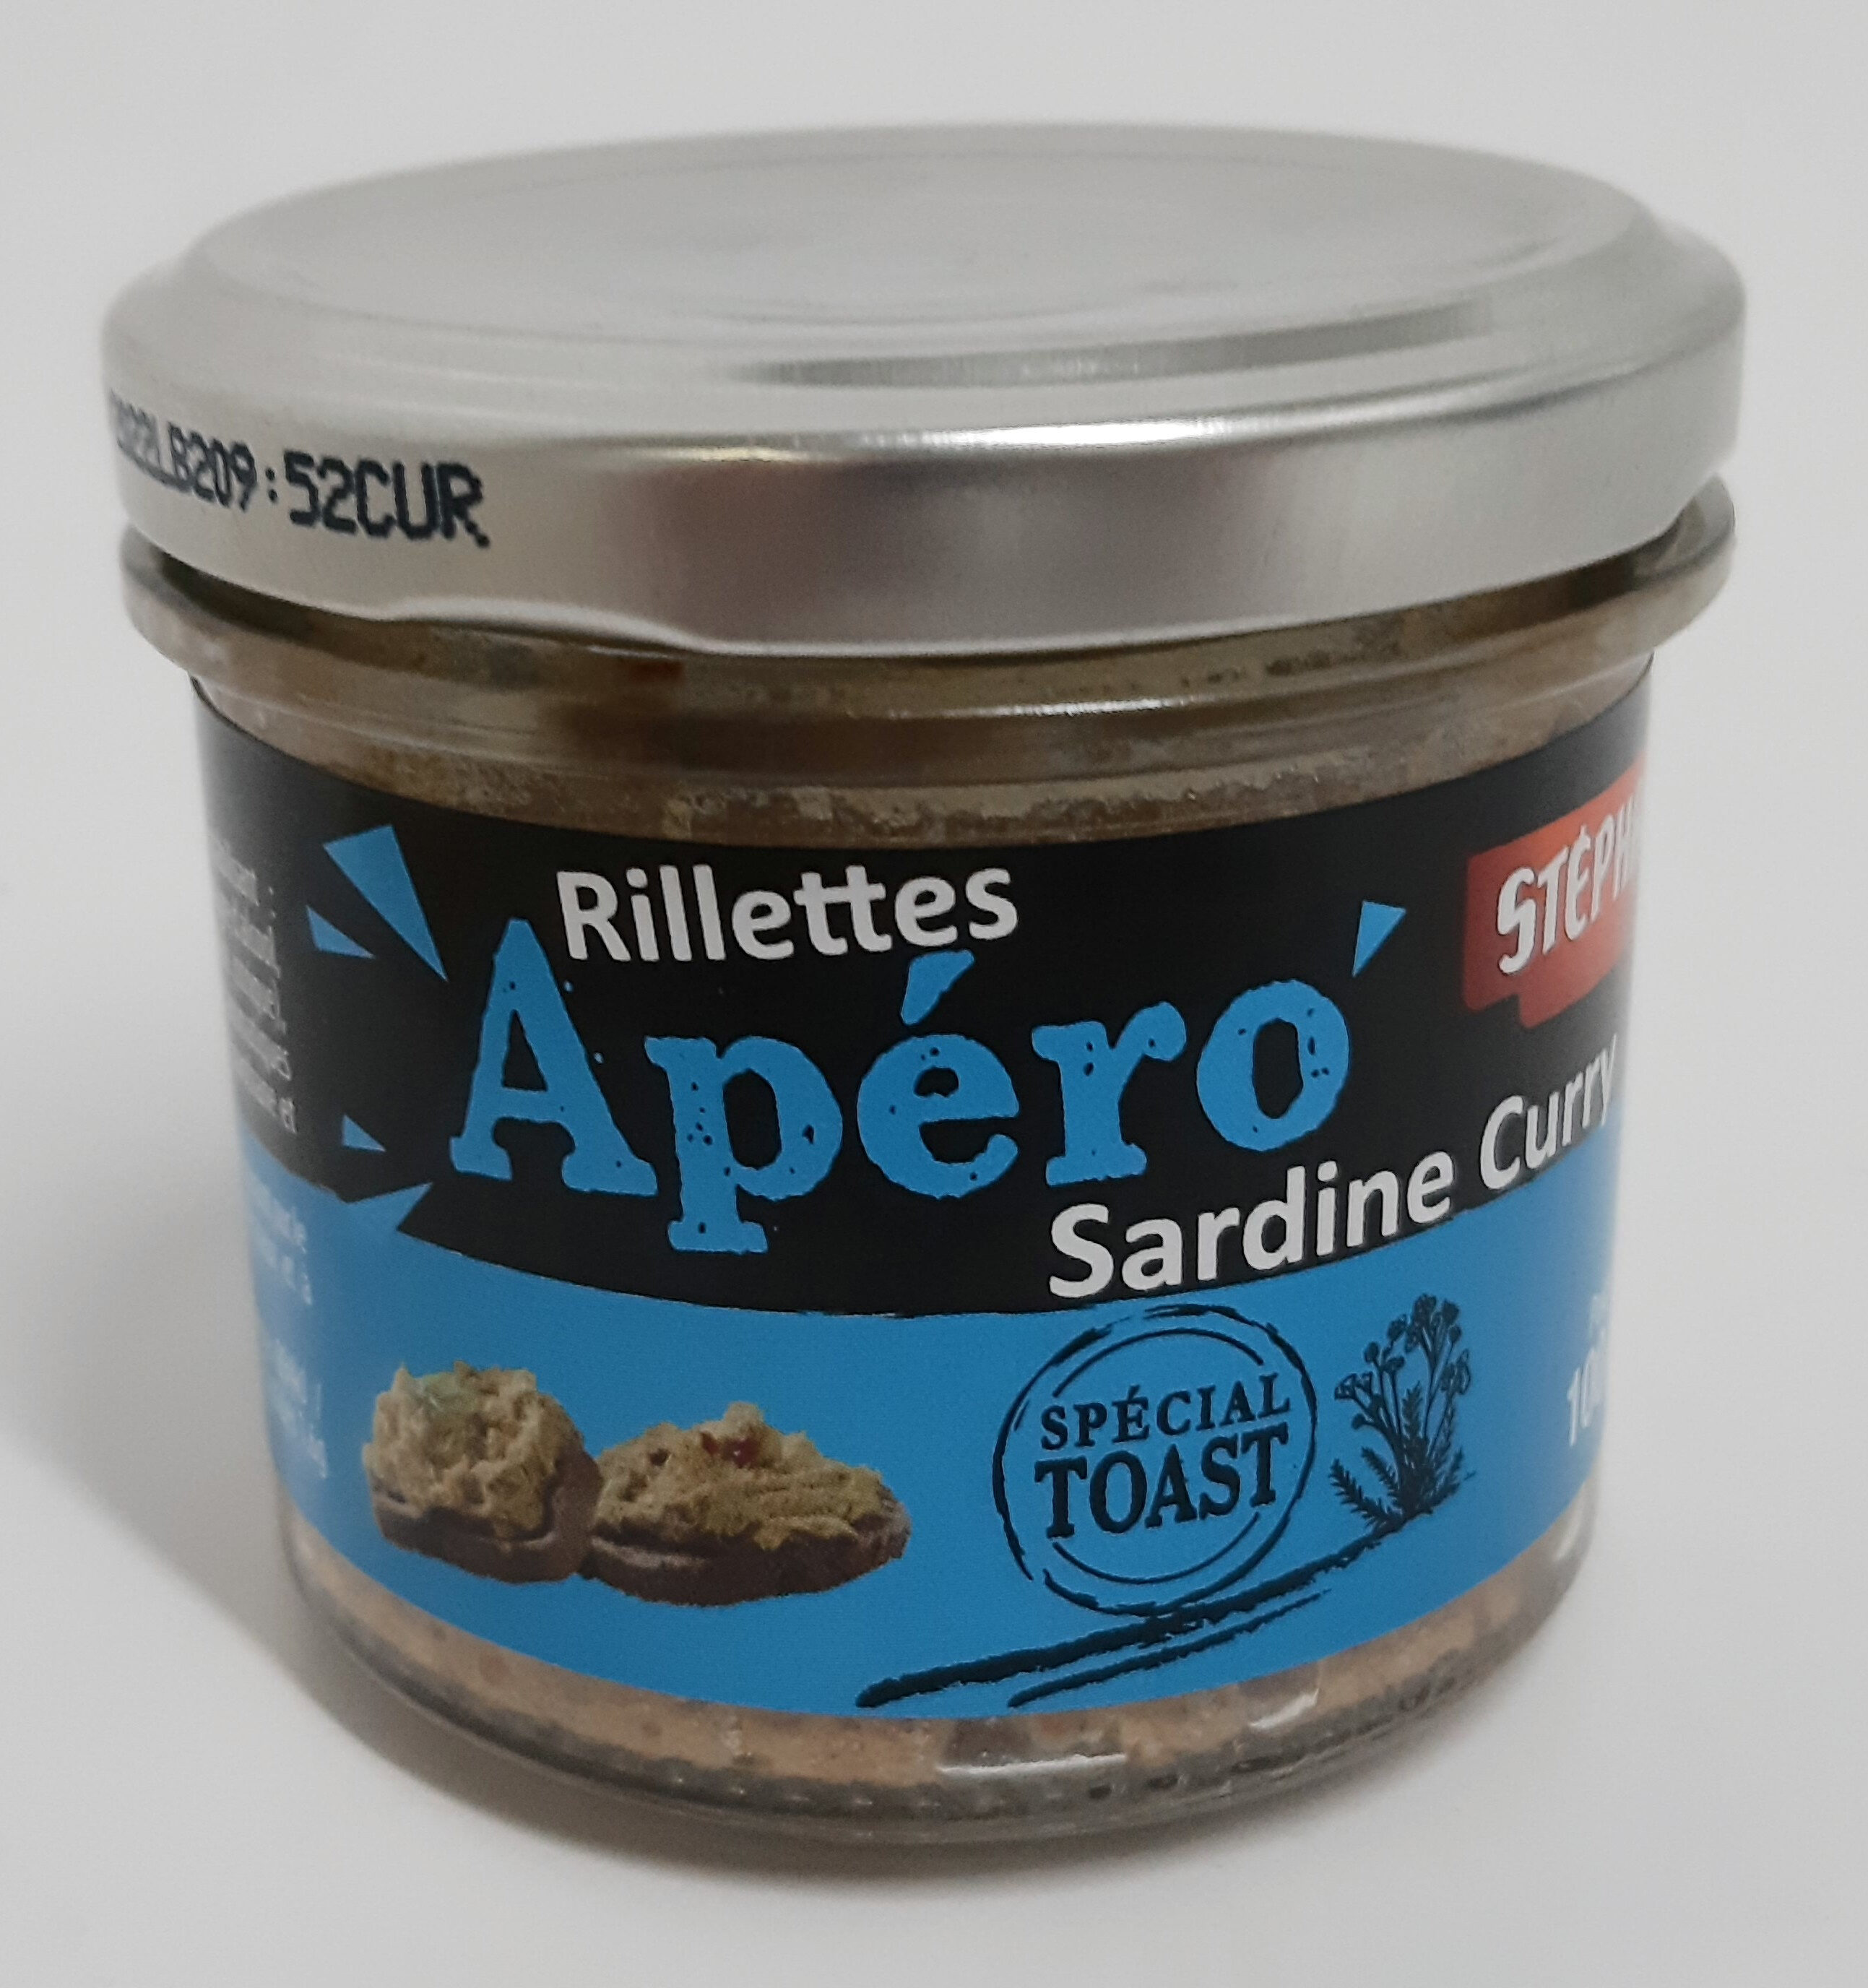 Rillettes Apero Sardine Curry - Produit - fr